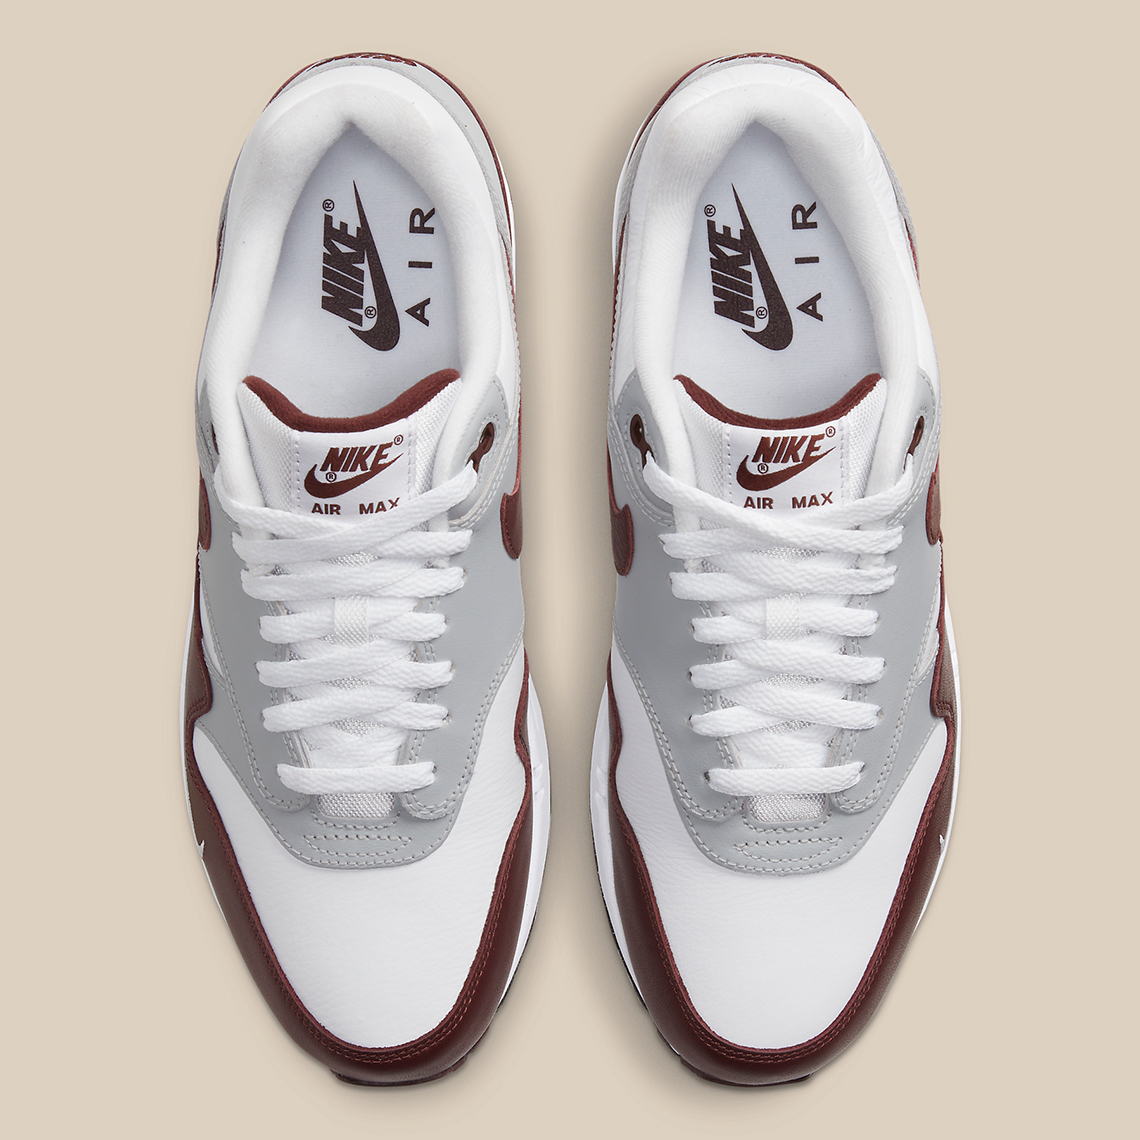 Nike Air Max 1 DB5074-101 Release Info | SneakerNews.com